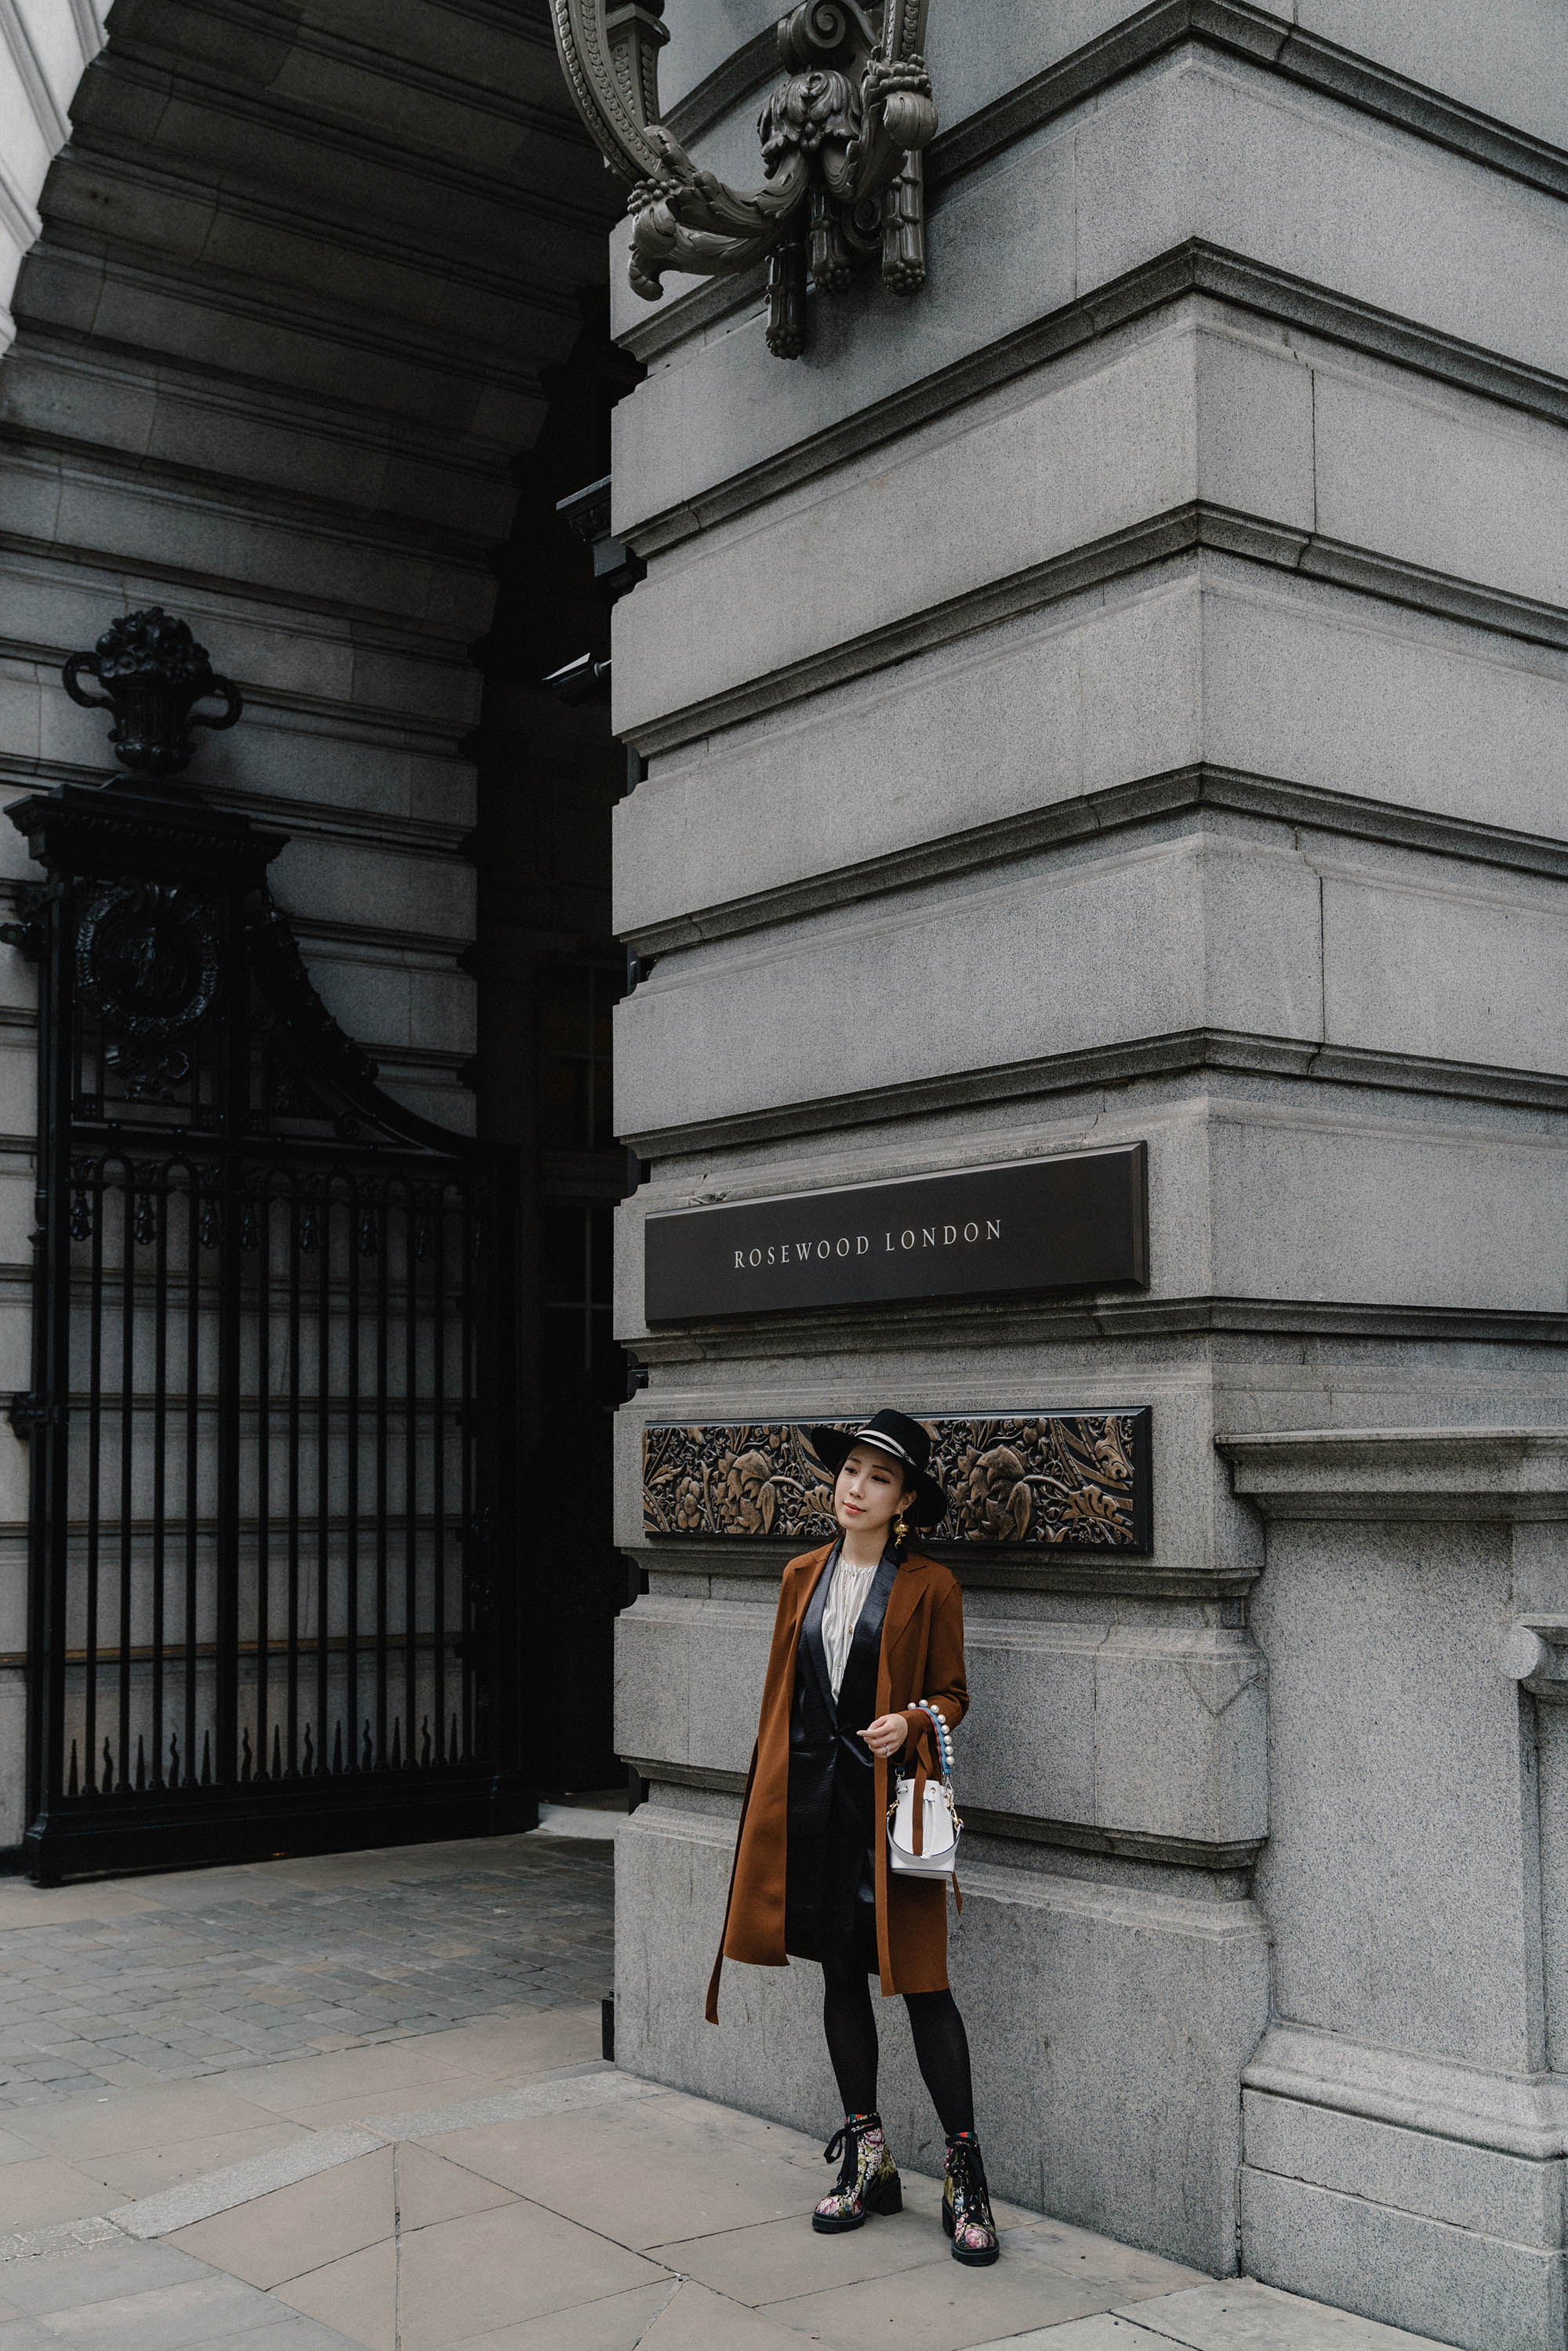 Erica in London for NARS x Erdem